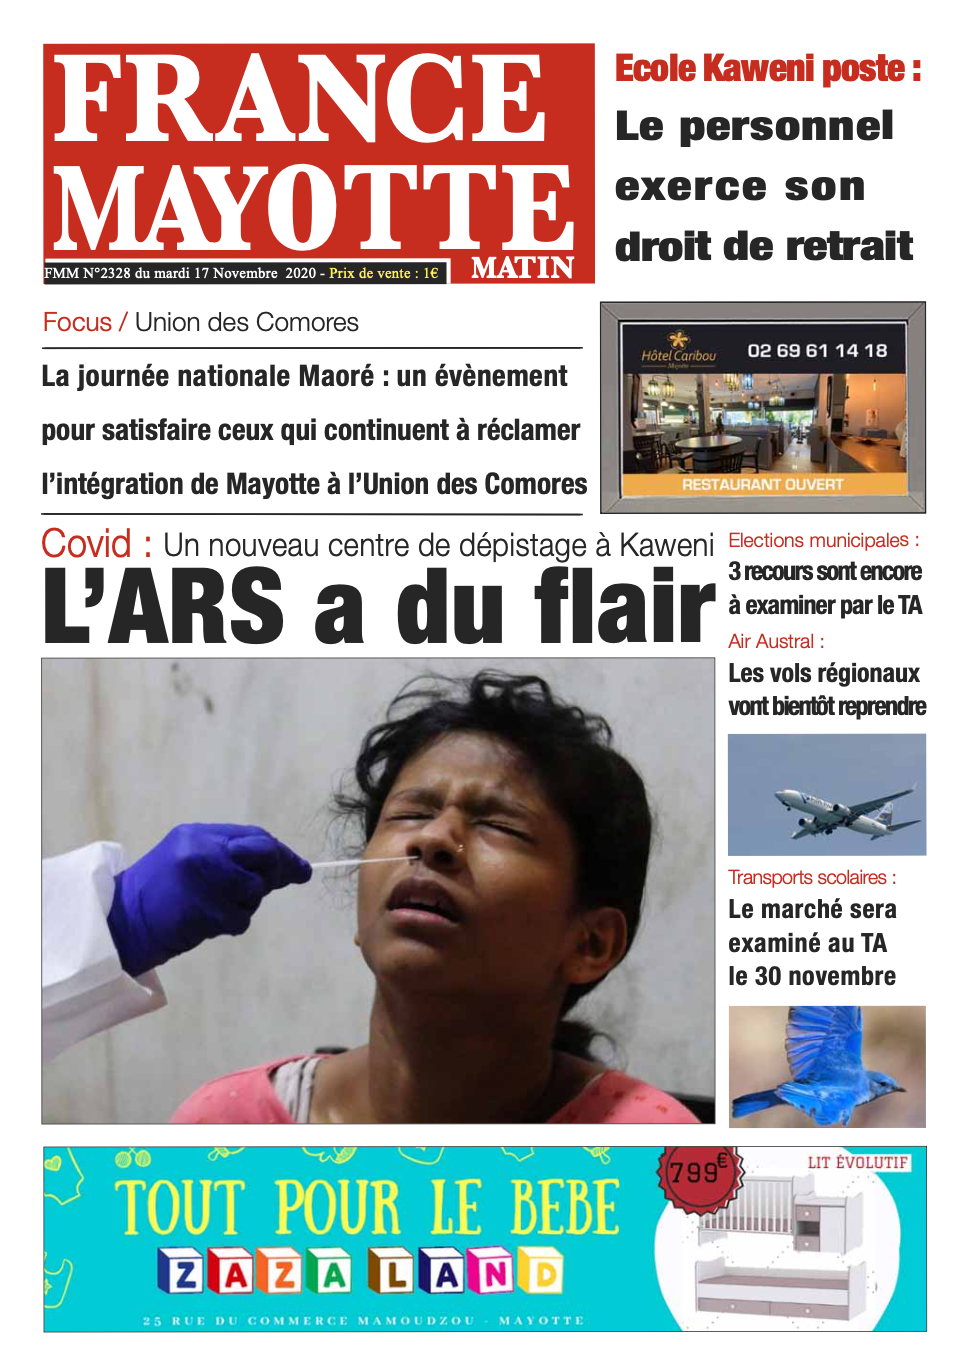 France Mayotte Mardi 17 novembre 2020